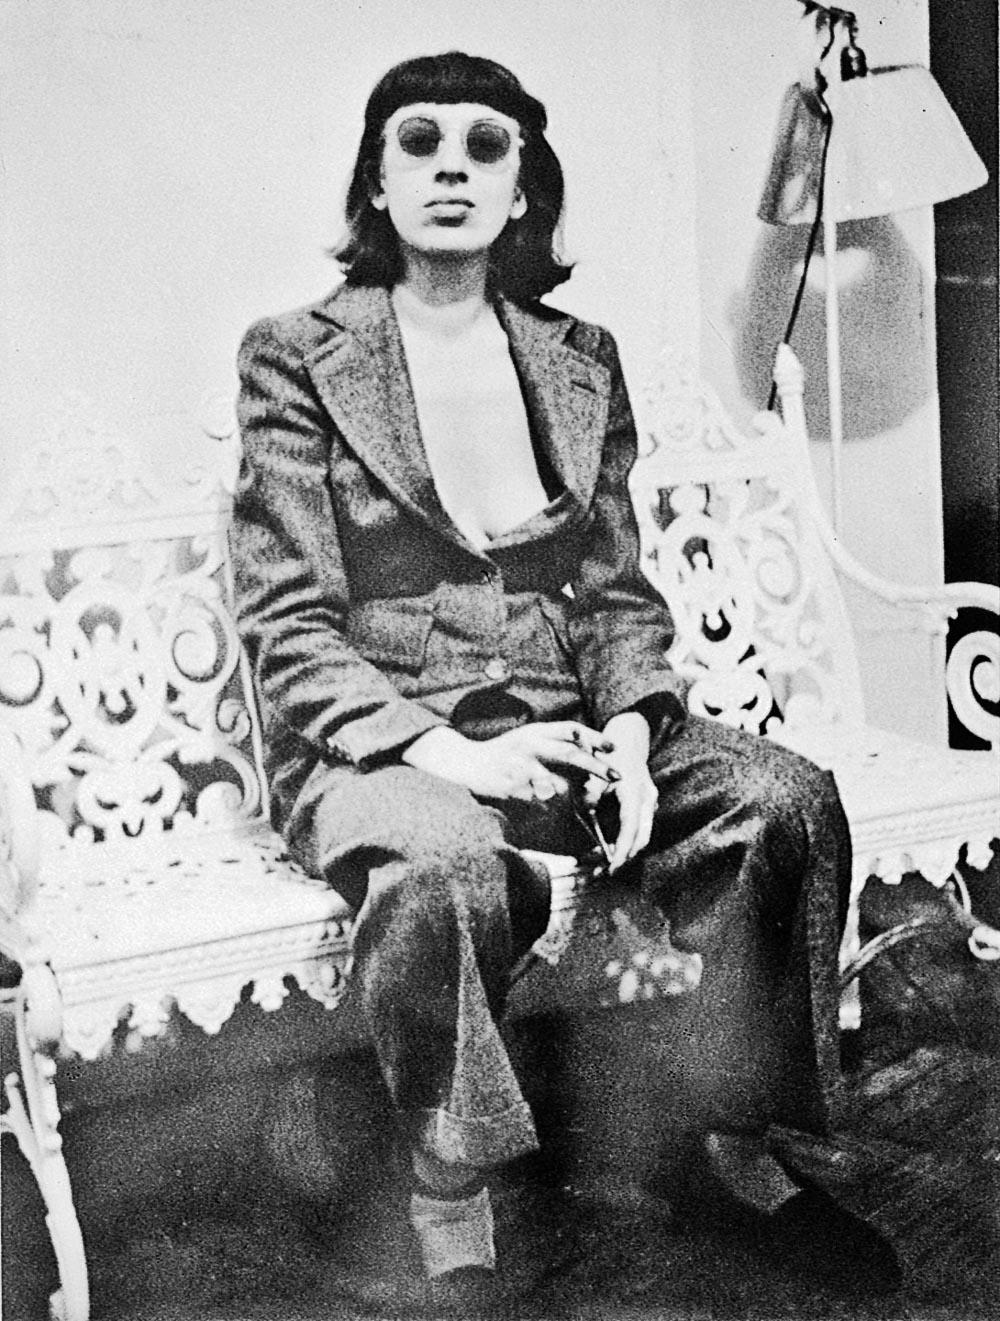 Lee Krasner, ca. 1938, unbekannter Fotograf.